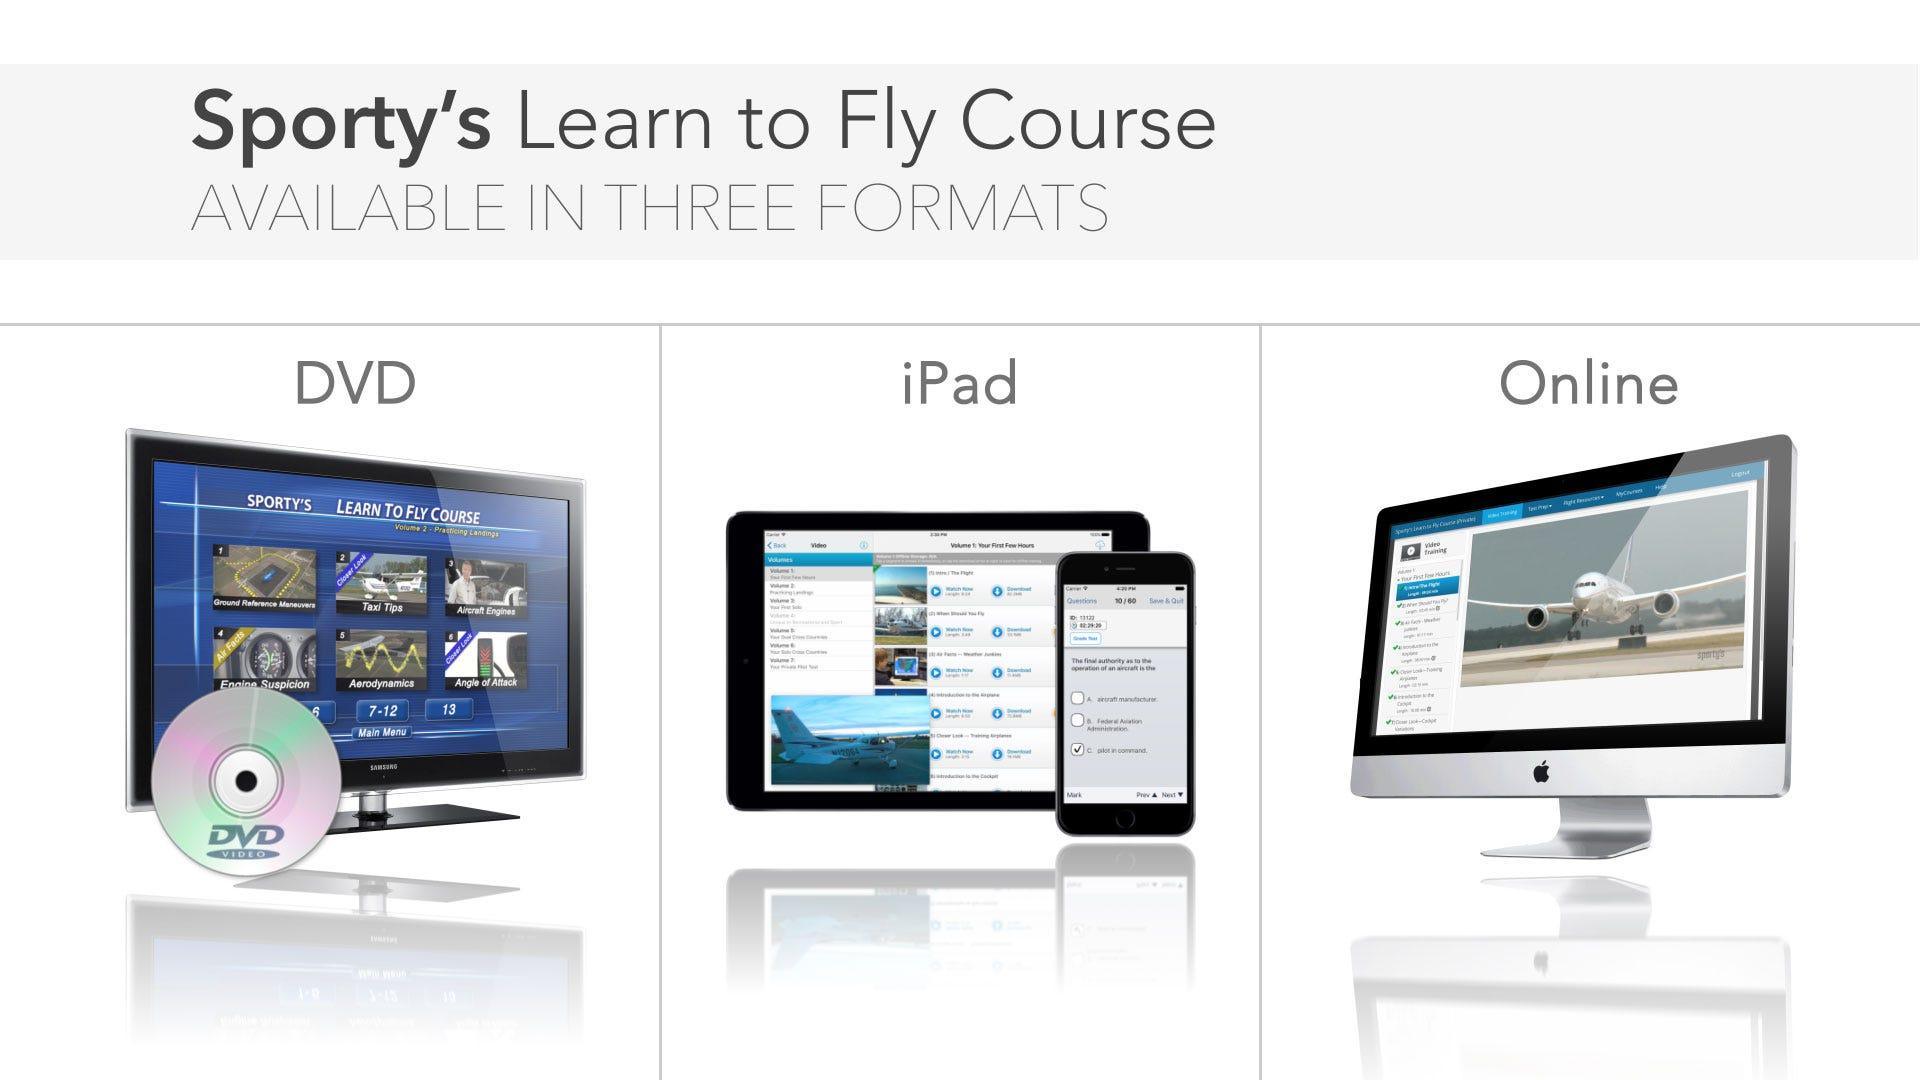 Three formats